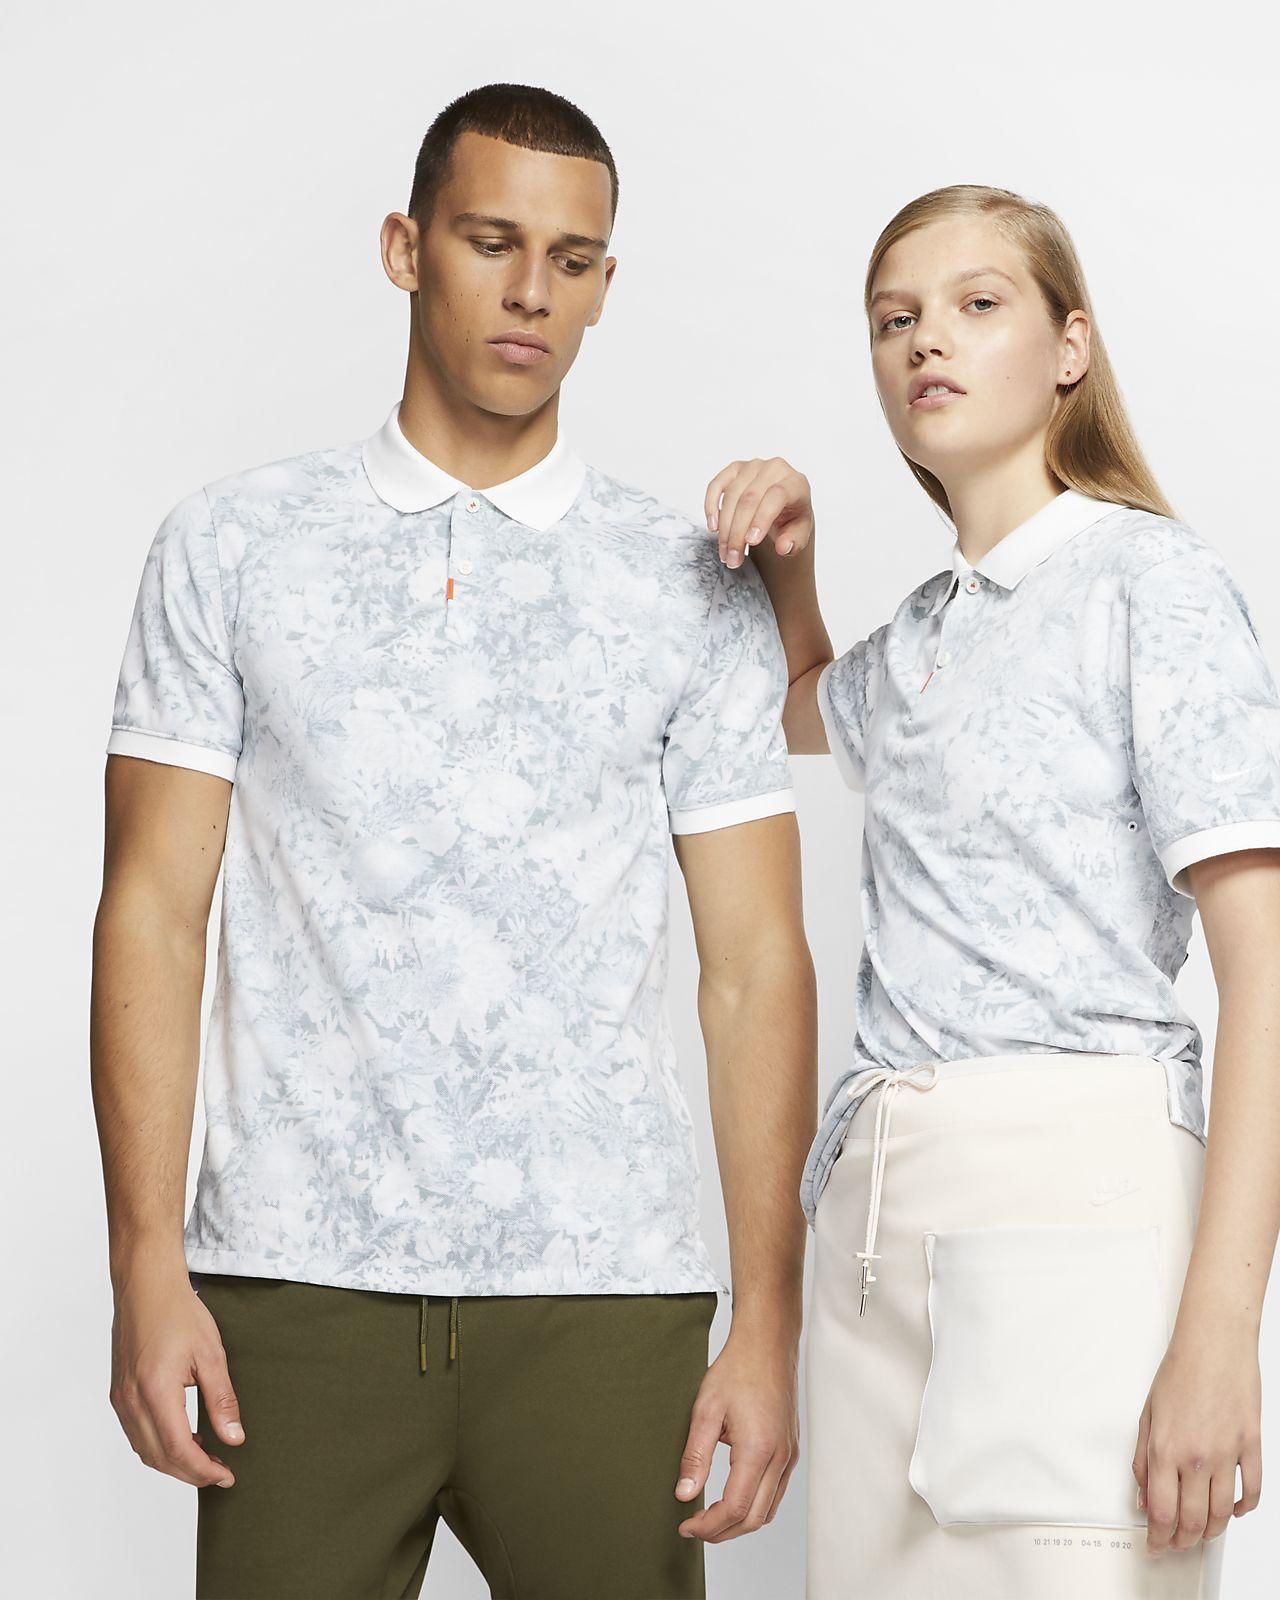 Polo con stampa floreale The Nike Polo - Unisex